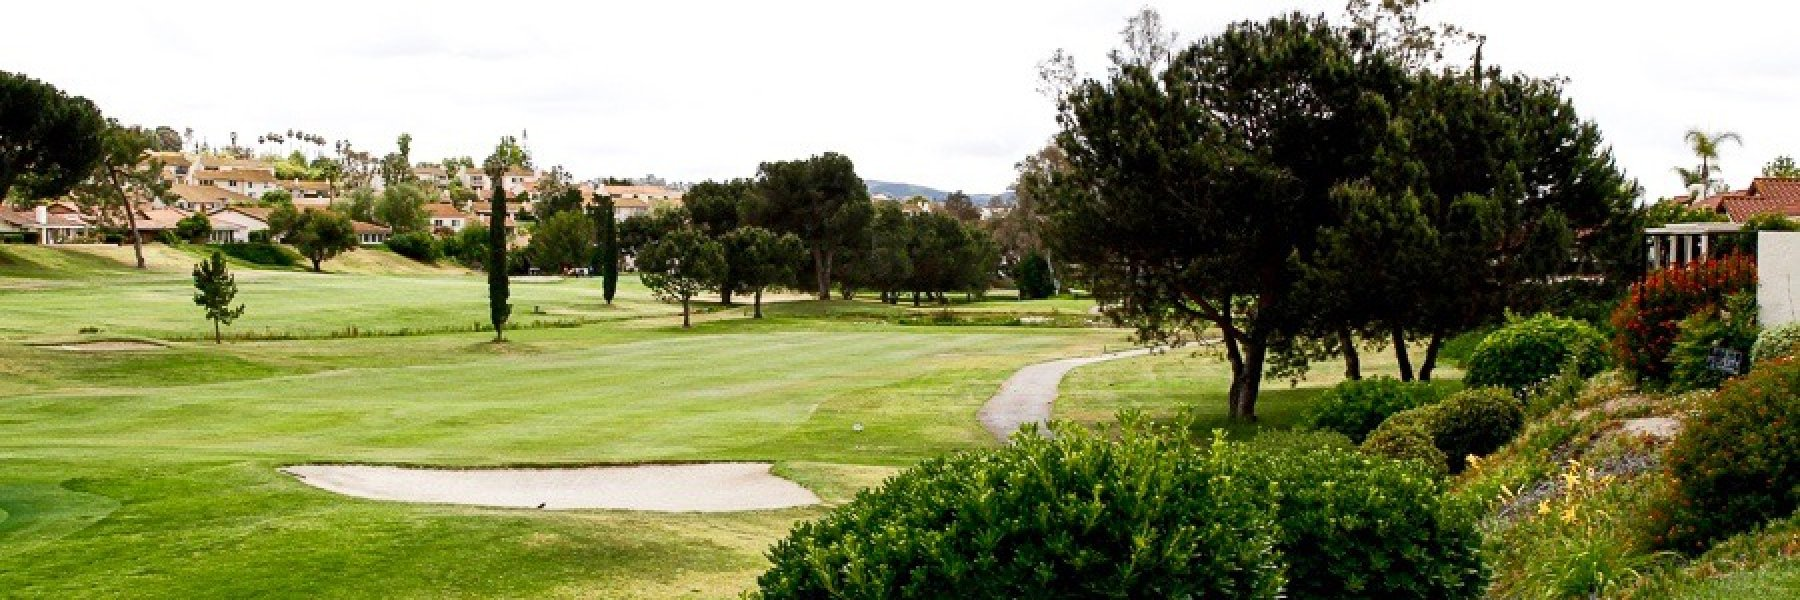 The Chapala is a community of homes in Rancho Bernardo California